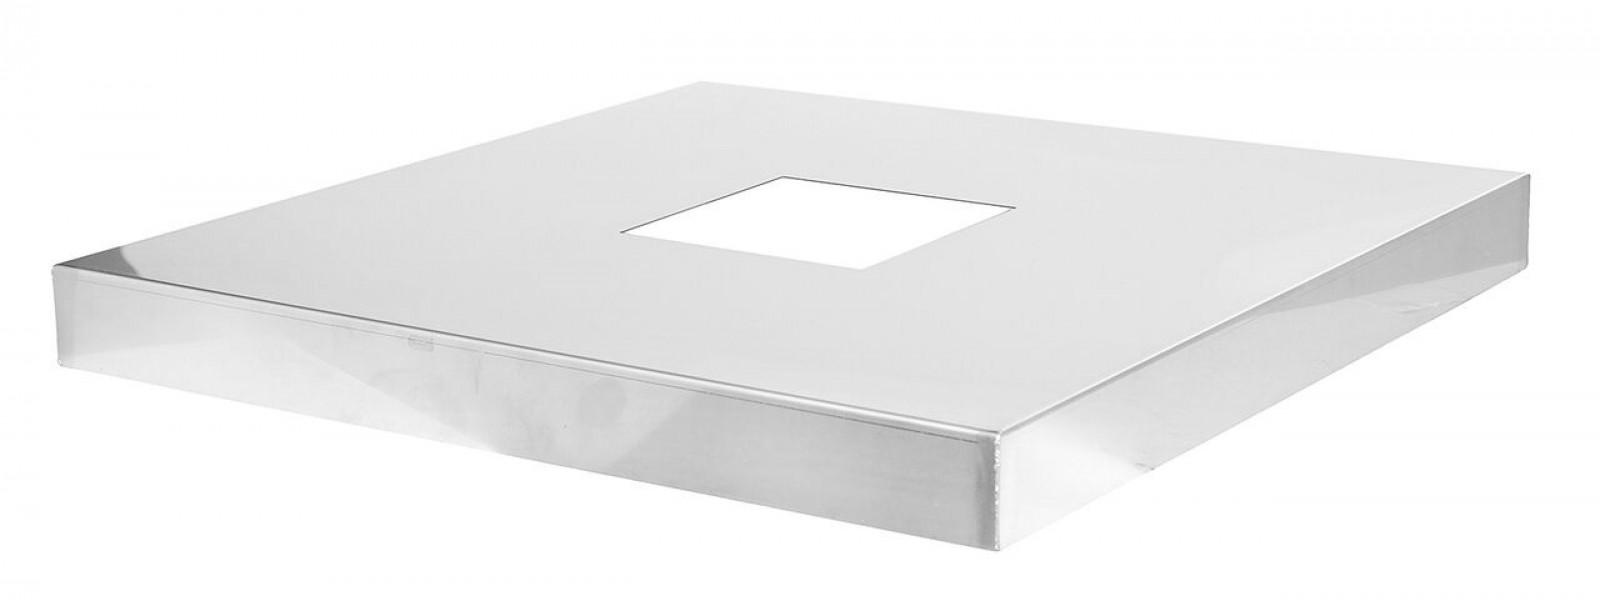 kaminabdeckplatte edelstahl rauchfang fachhandel. Black Bedroom Furniture Sets. Home Design Ideas